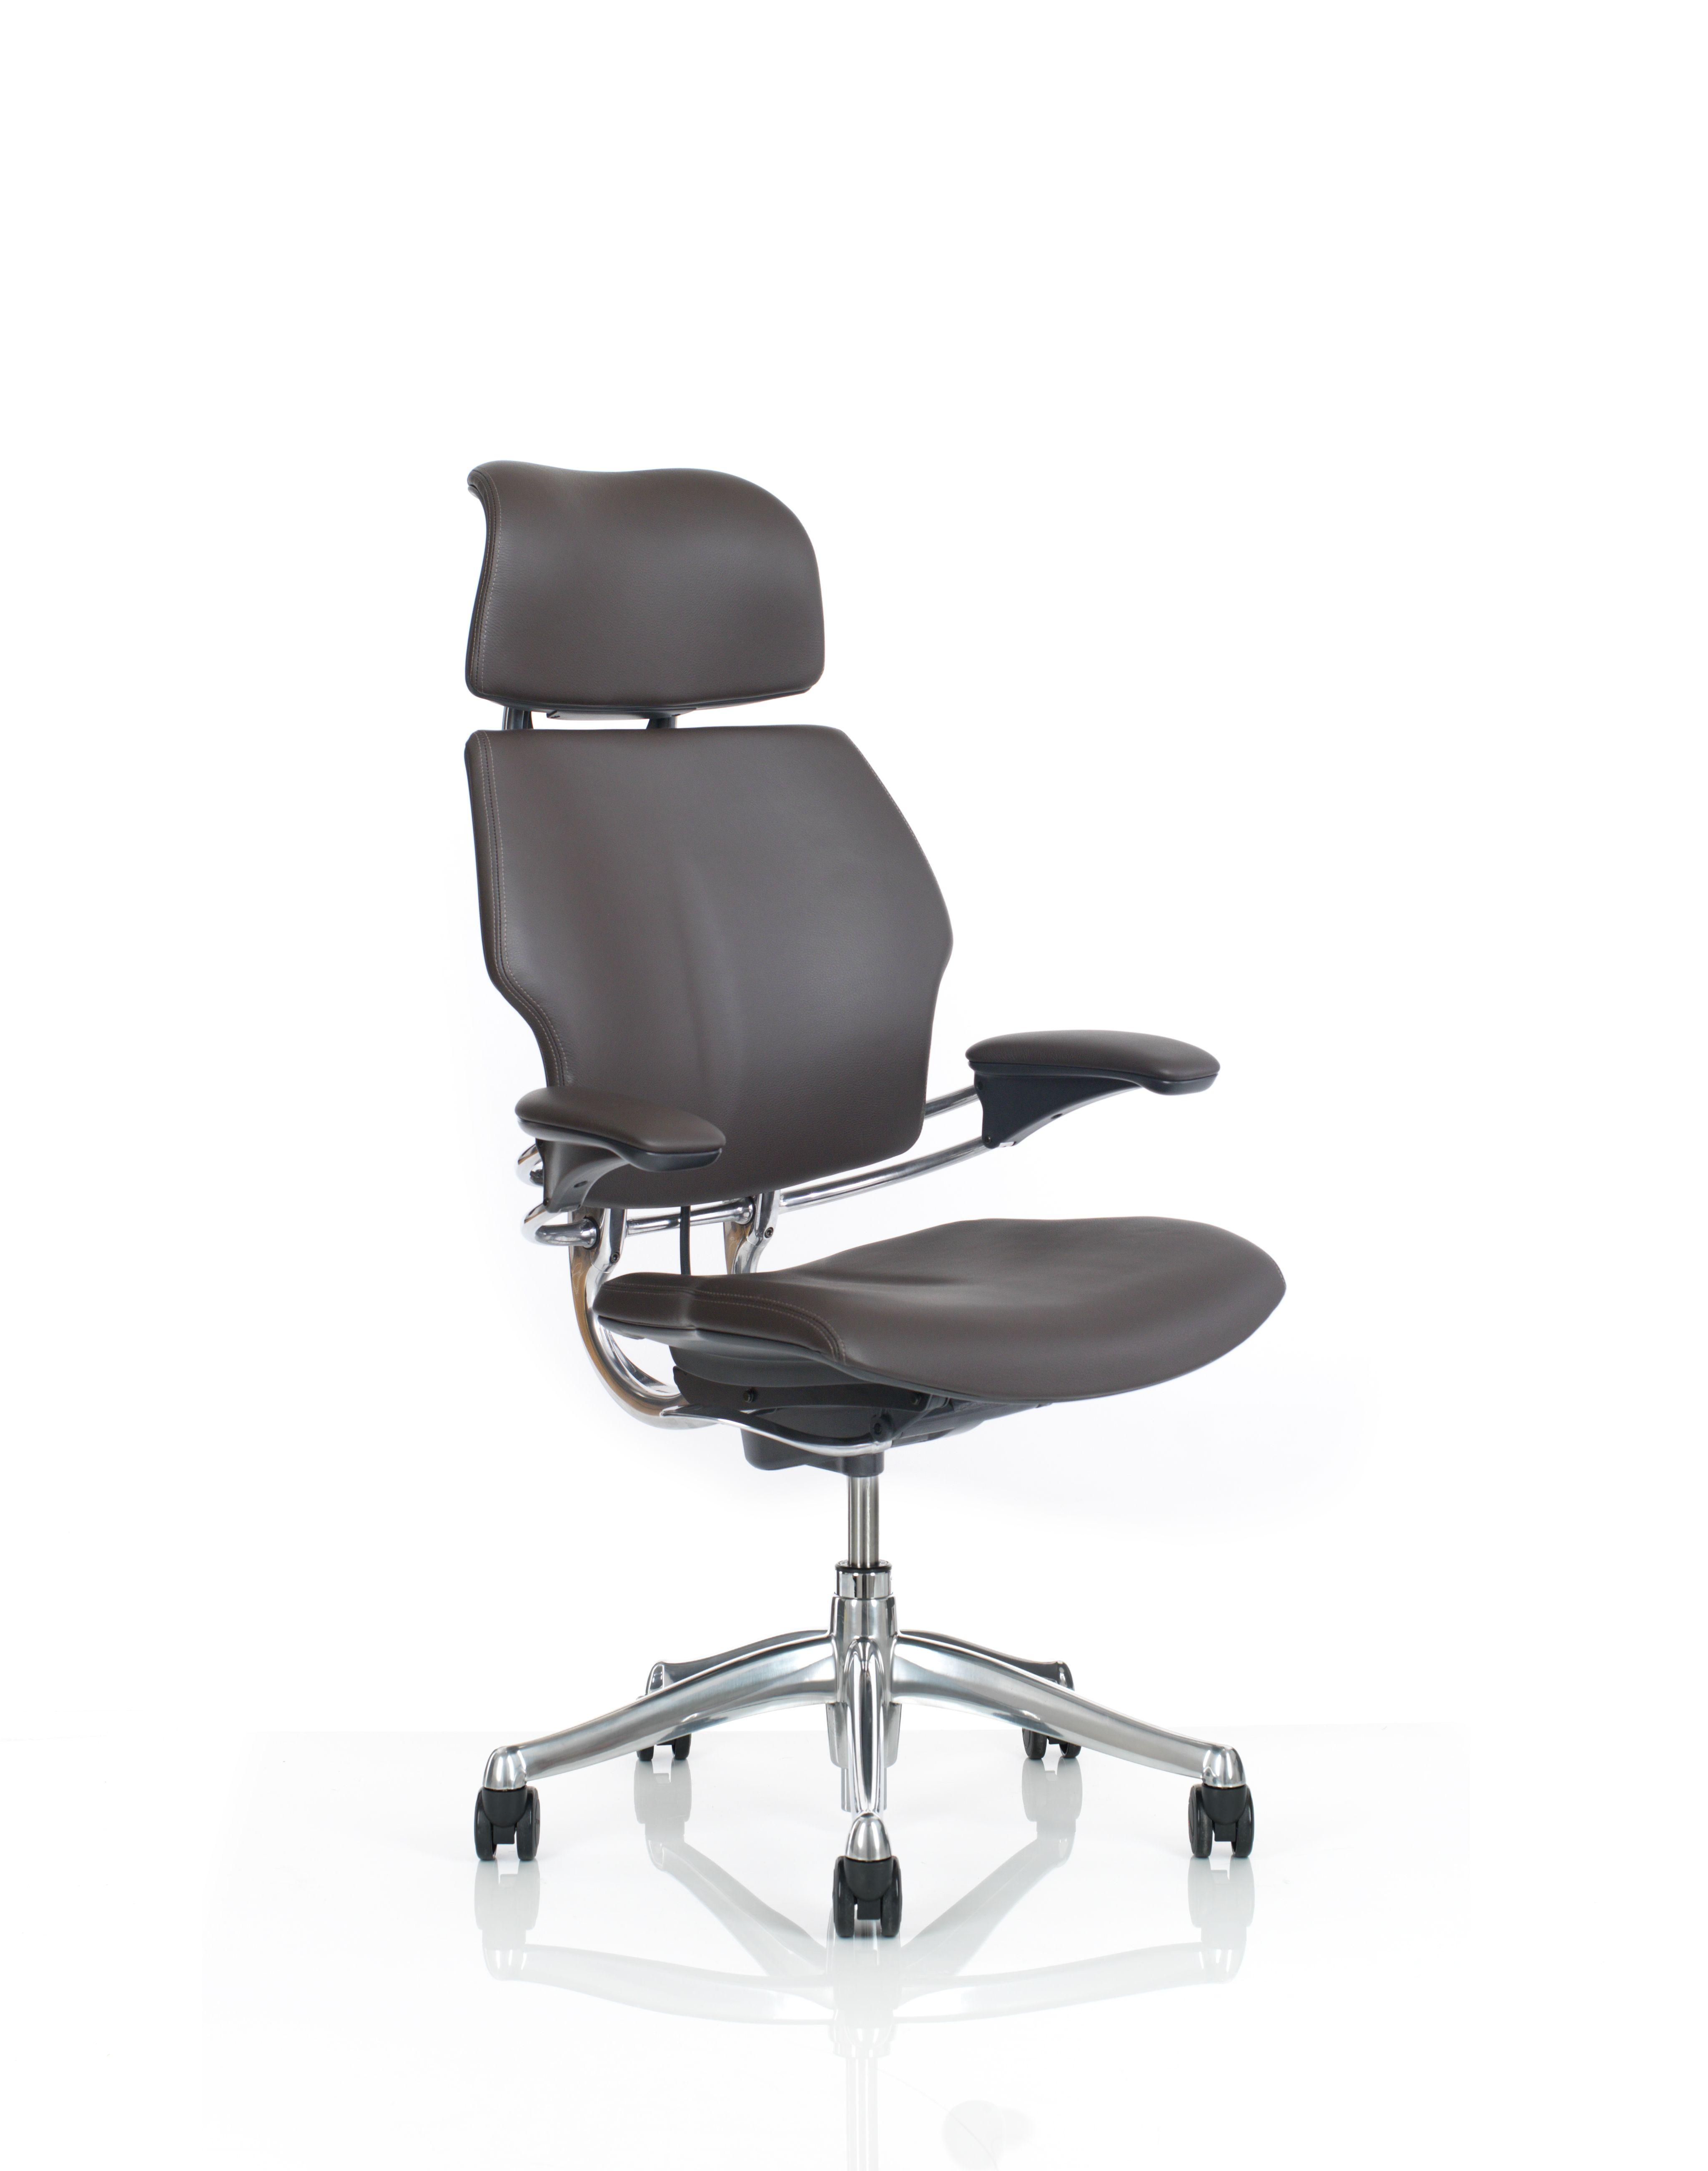 Freedom Headrest Chair Humanscale Ergonomic Office Furniture Office Chair Executive Office Chairs